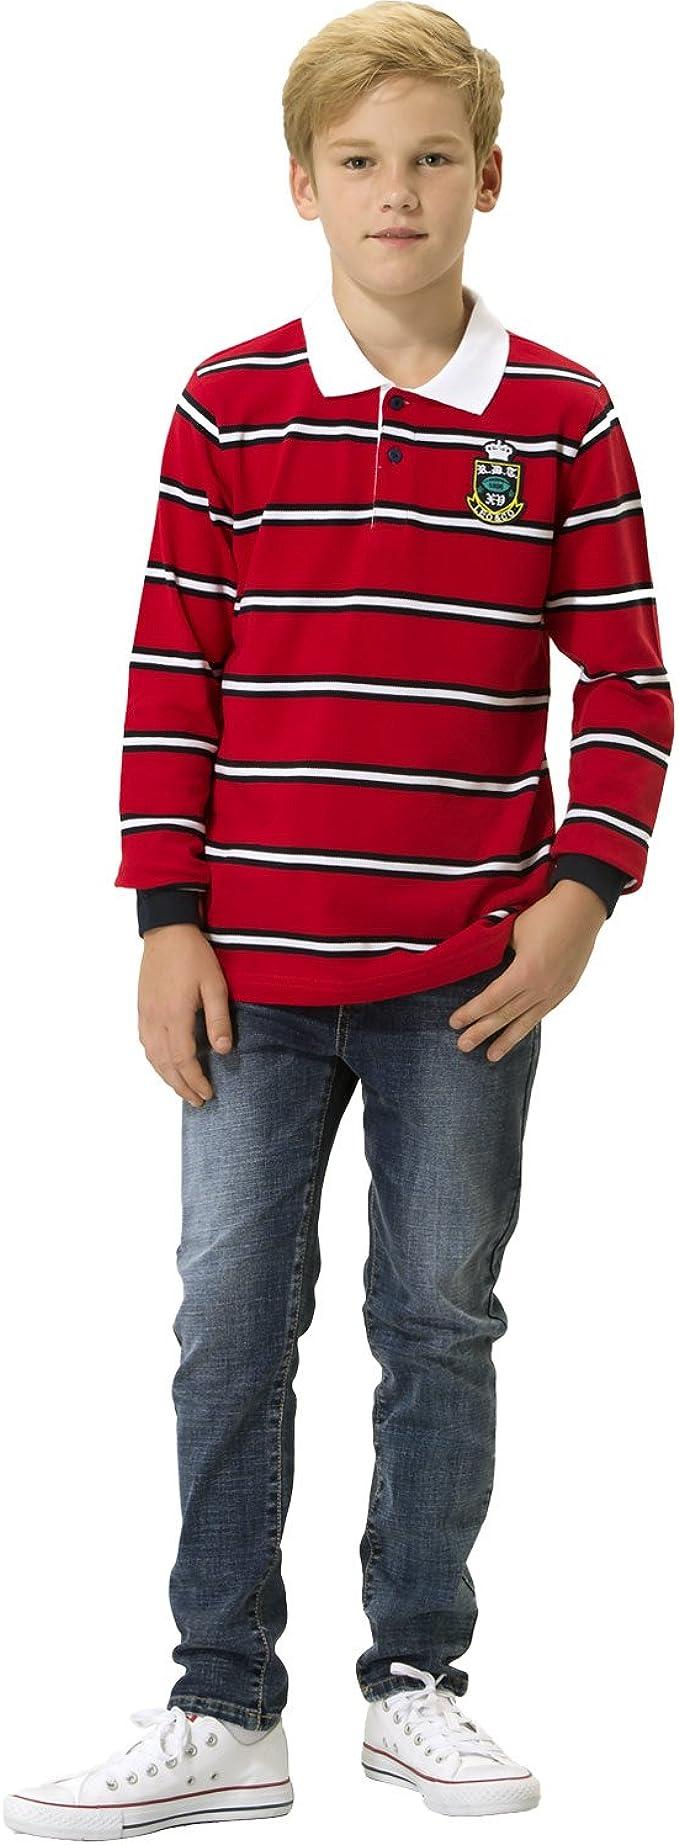 LEO/&LILY Boys Kids Elastic Waist Husky Stretch Denim Jeans Dark LLB6A02